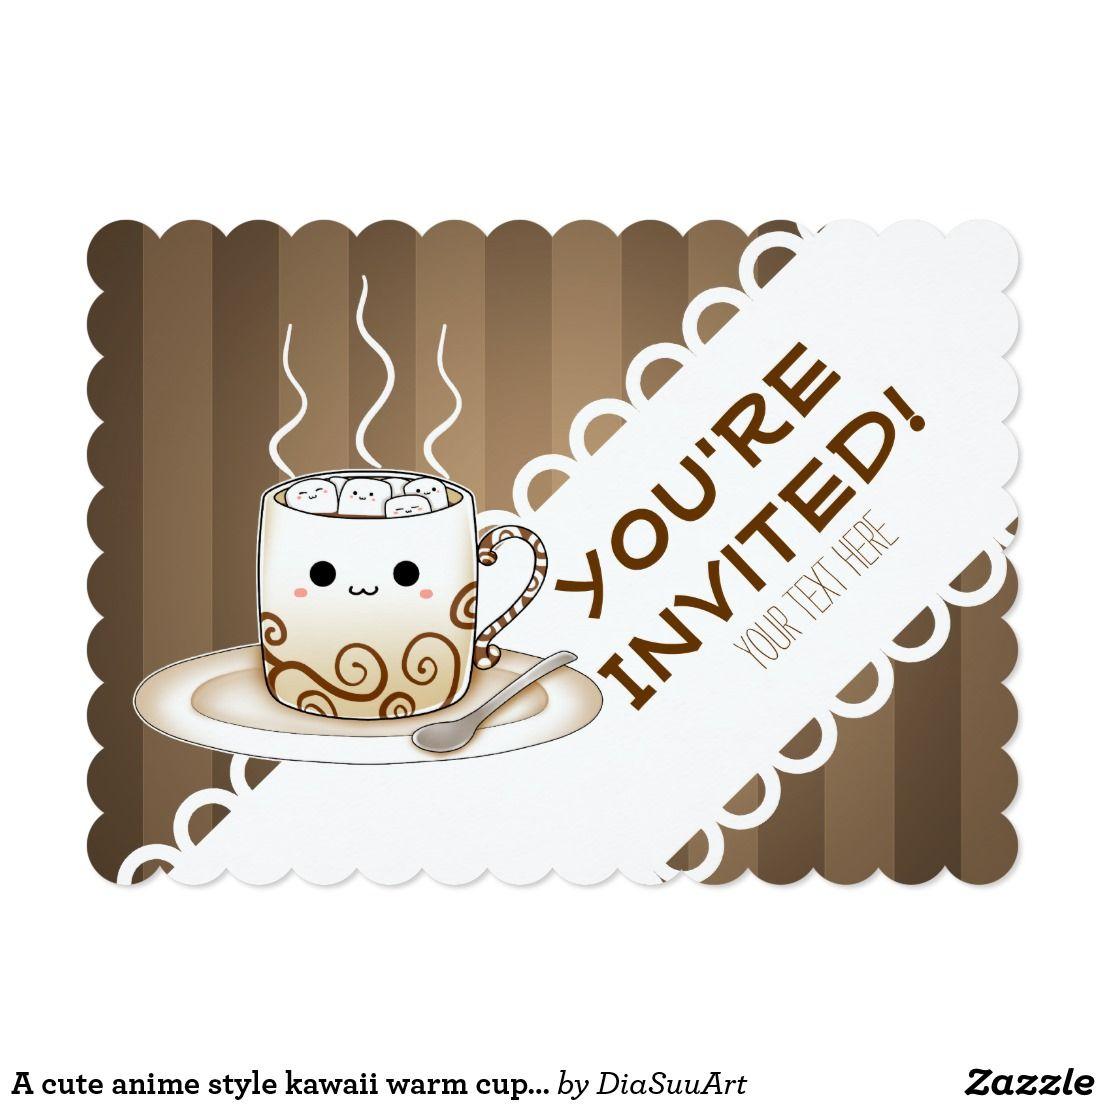 A cute anime style kawaii warm cup of cocoa invitation